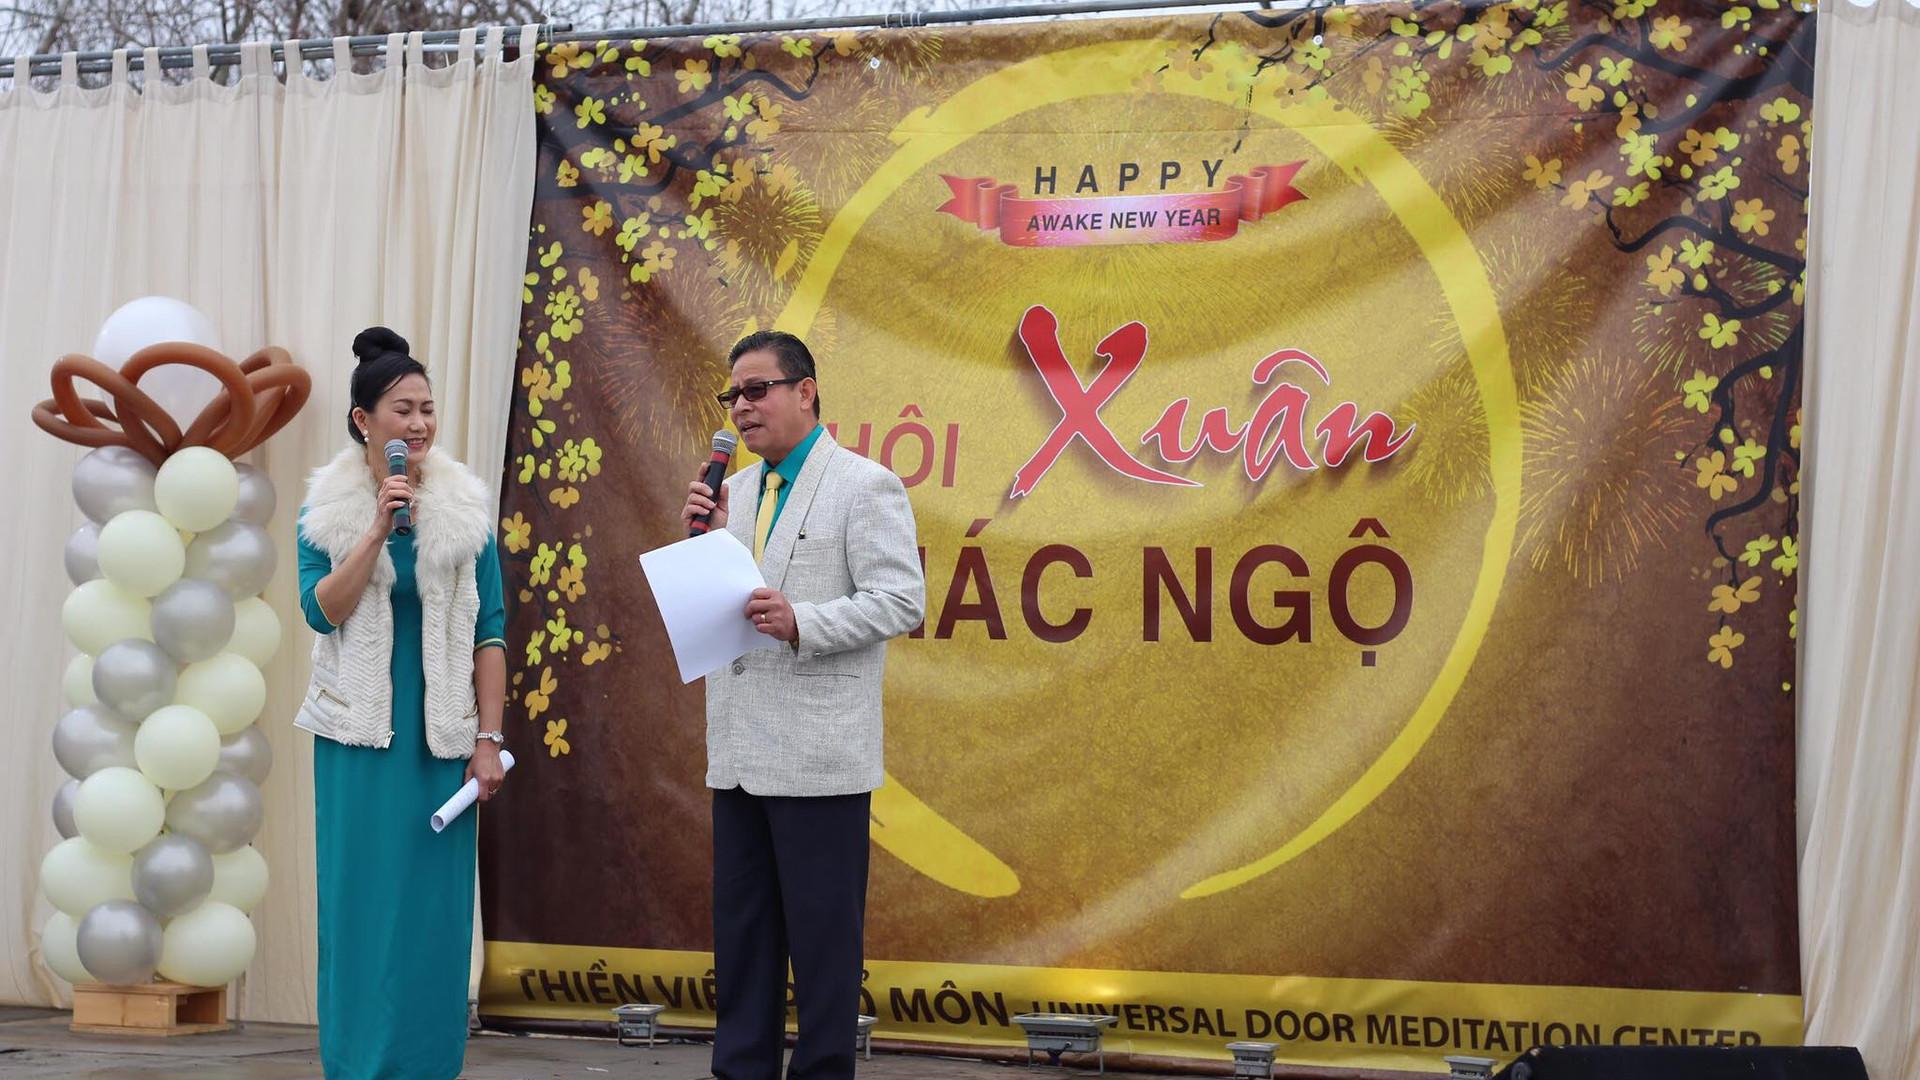 Hoi Xuan Giac Ngo 2018 38.jpg